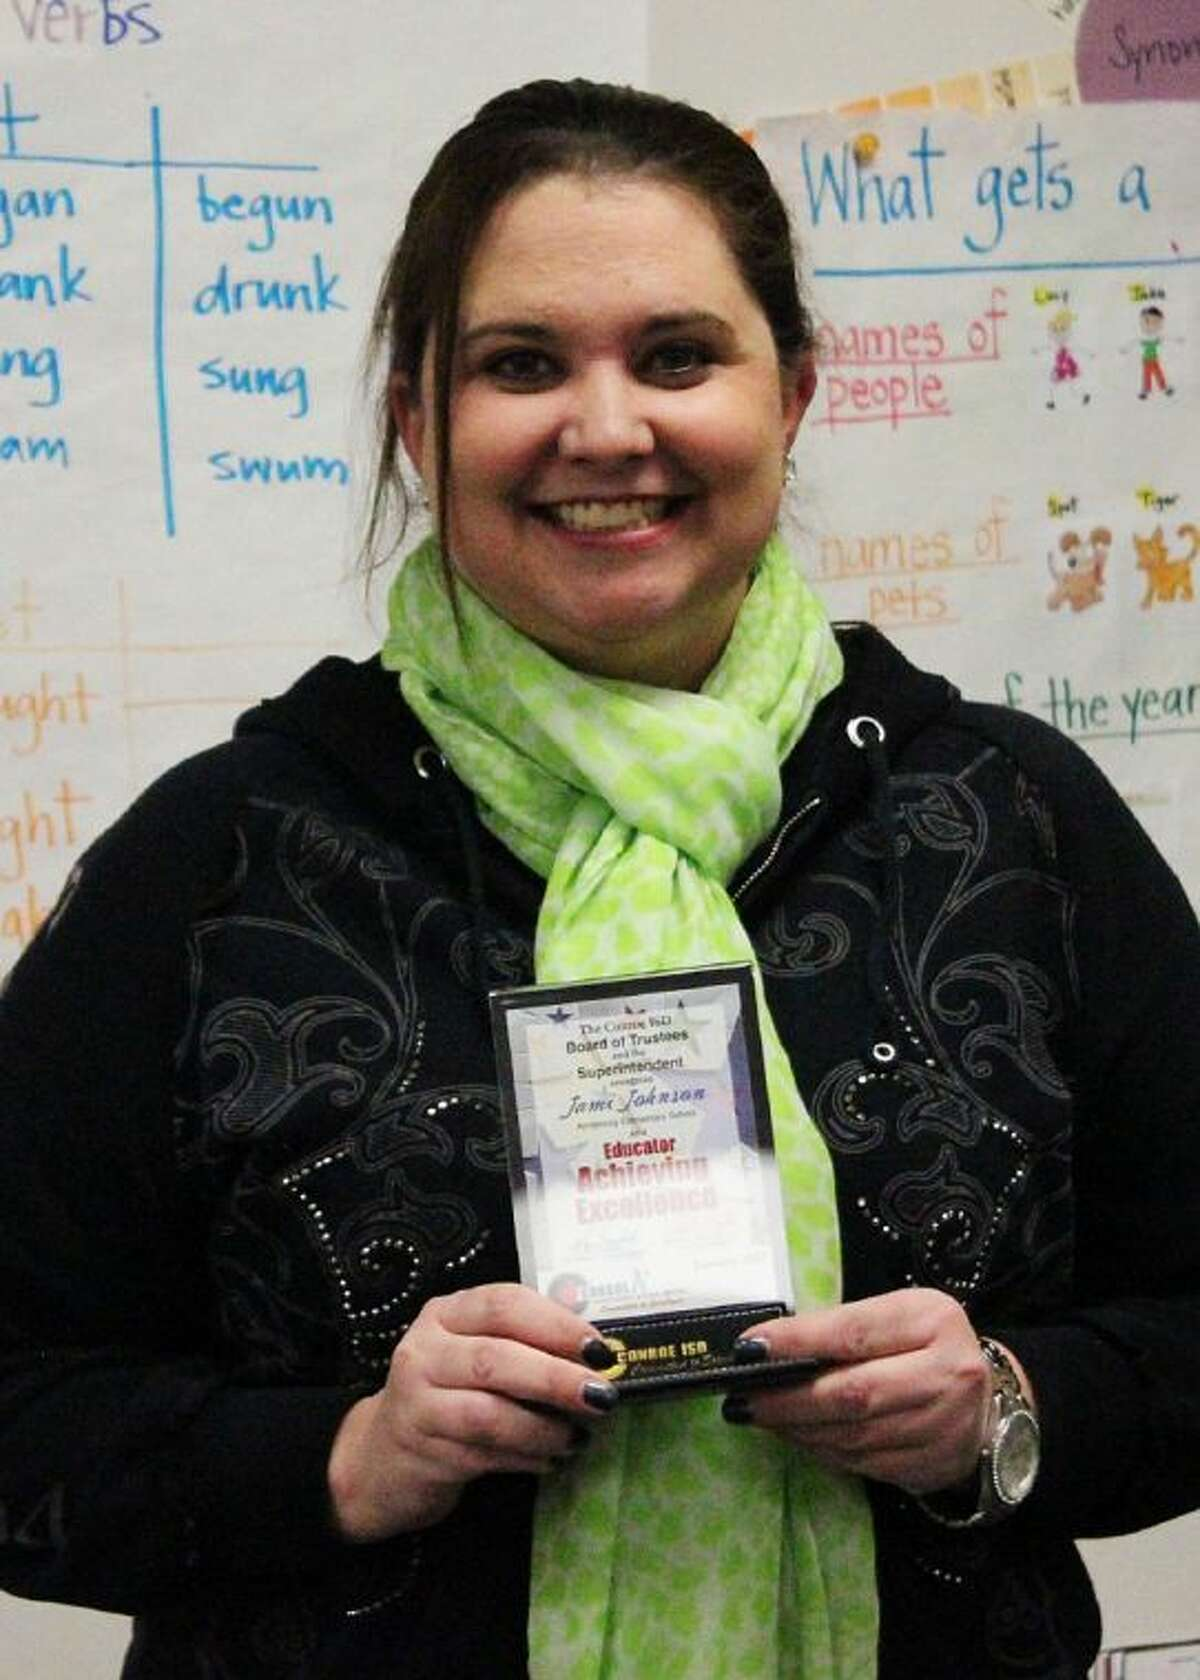 Conroe ISD recently recognized Jami Johnson as Armstrong Elementary's Educator Ambassa- dor.